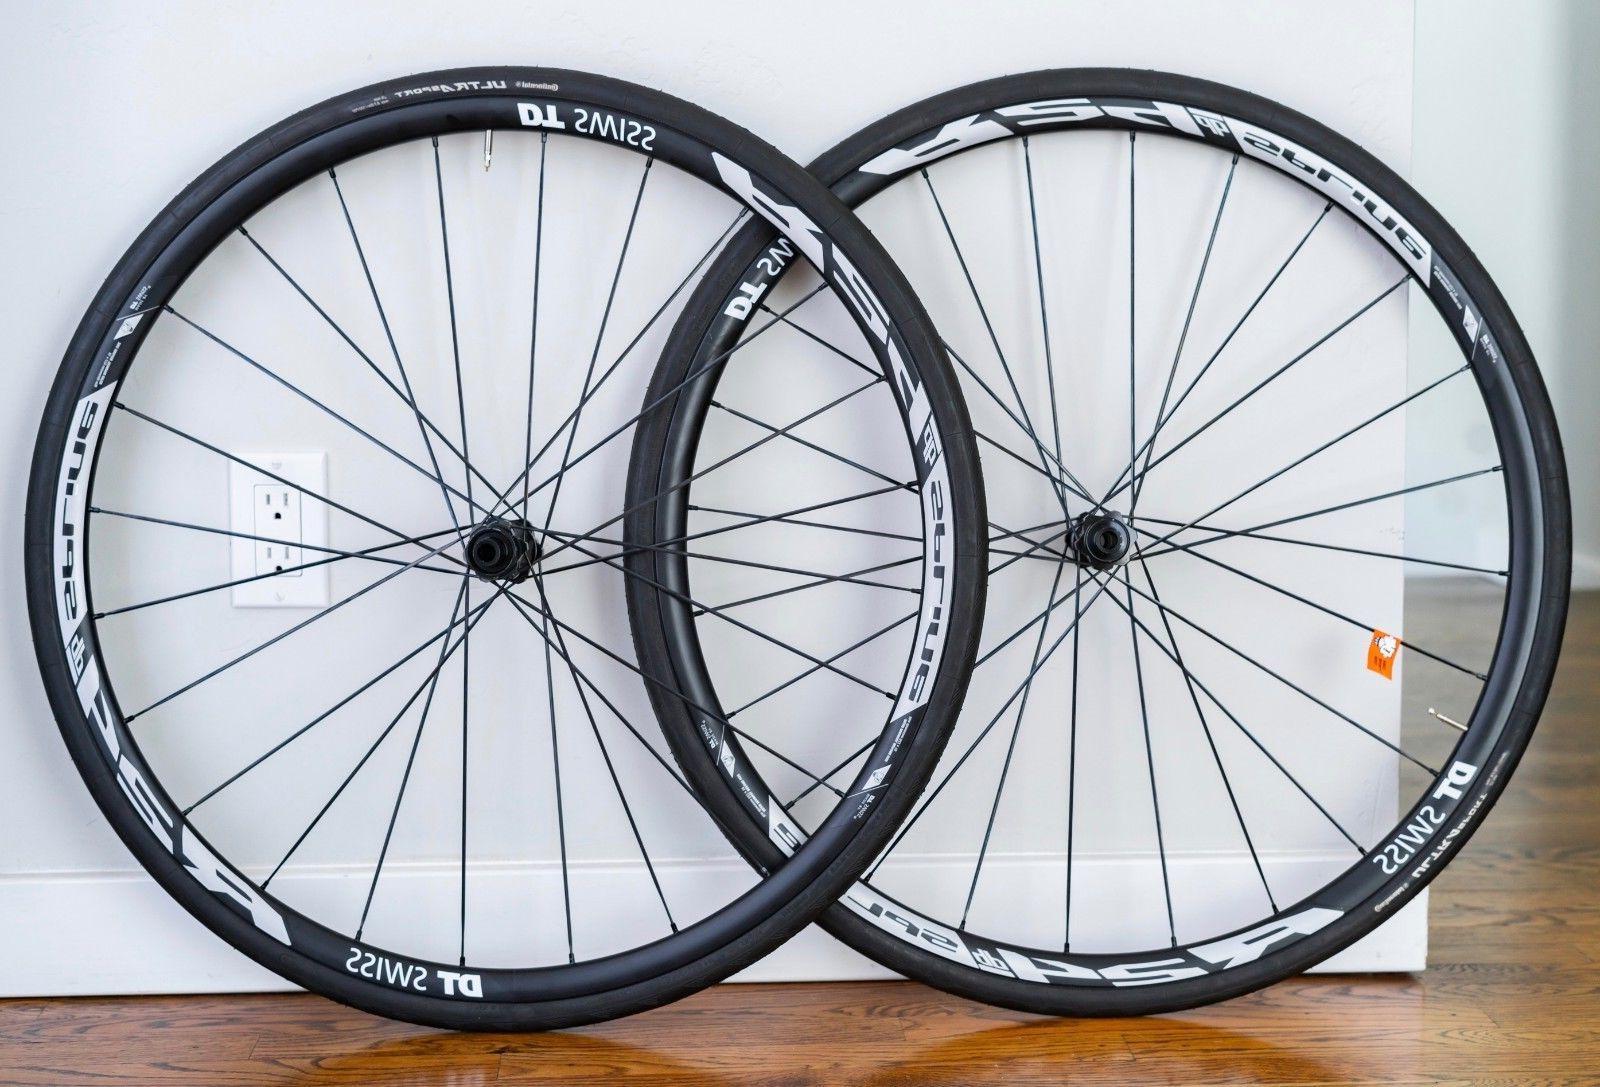 2017 Ridley Disc Ultegra Full Top-Class Aero Bike DEMO BIKE